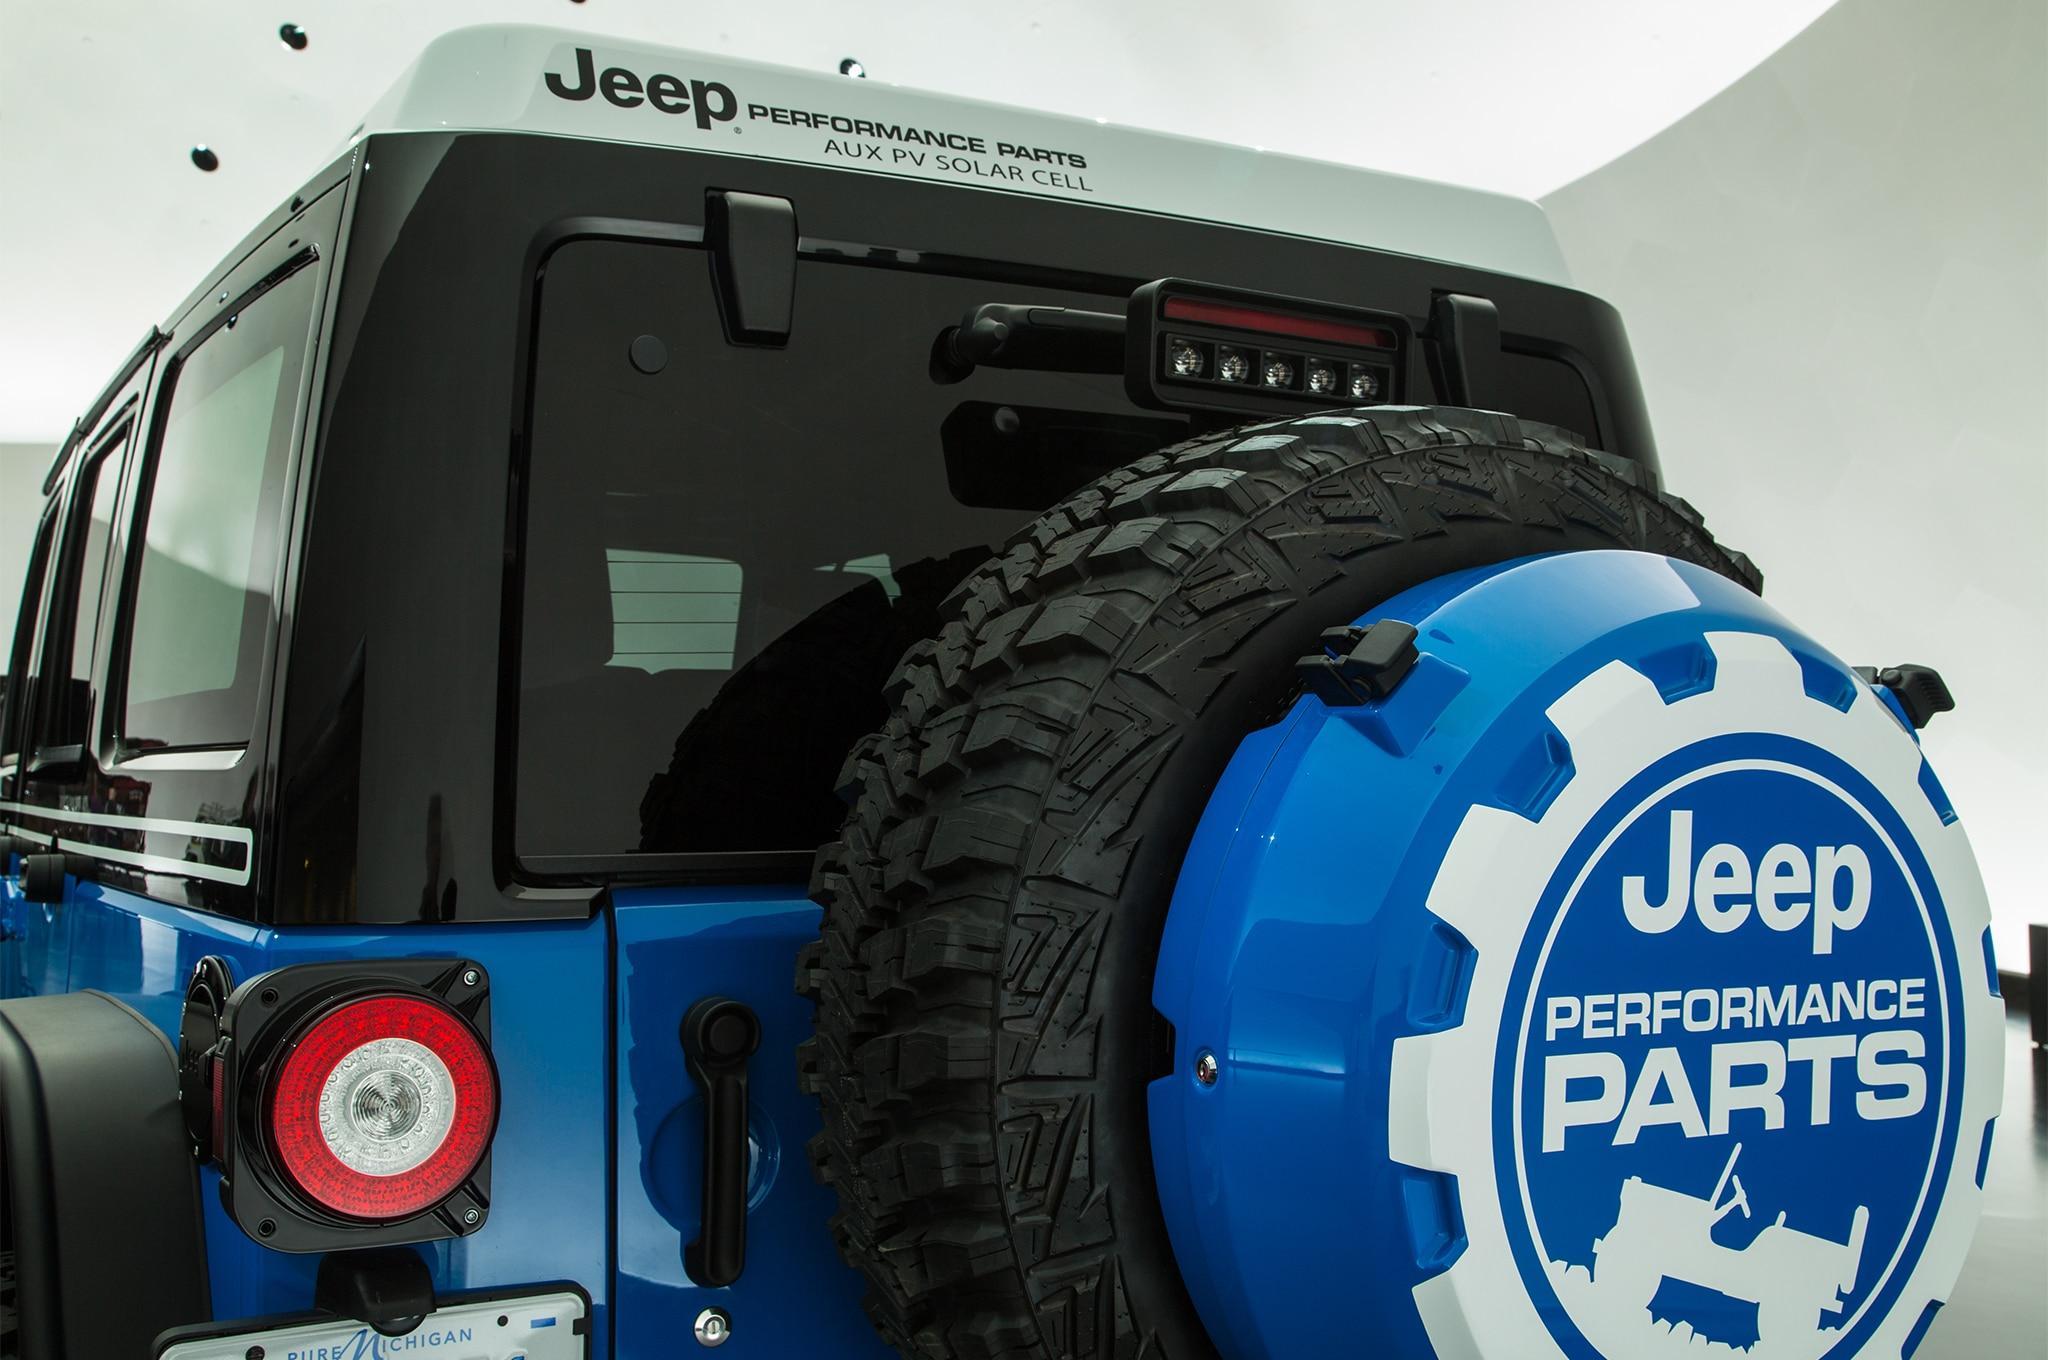 2017 jeep wrangler concept design 2017 -  2017 Moab Easter Jeep Safari Show More